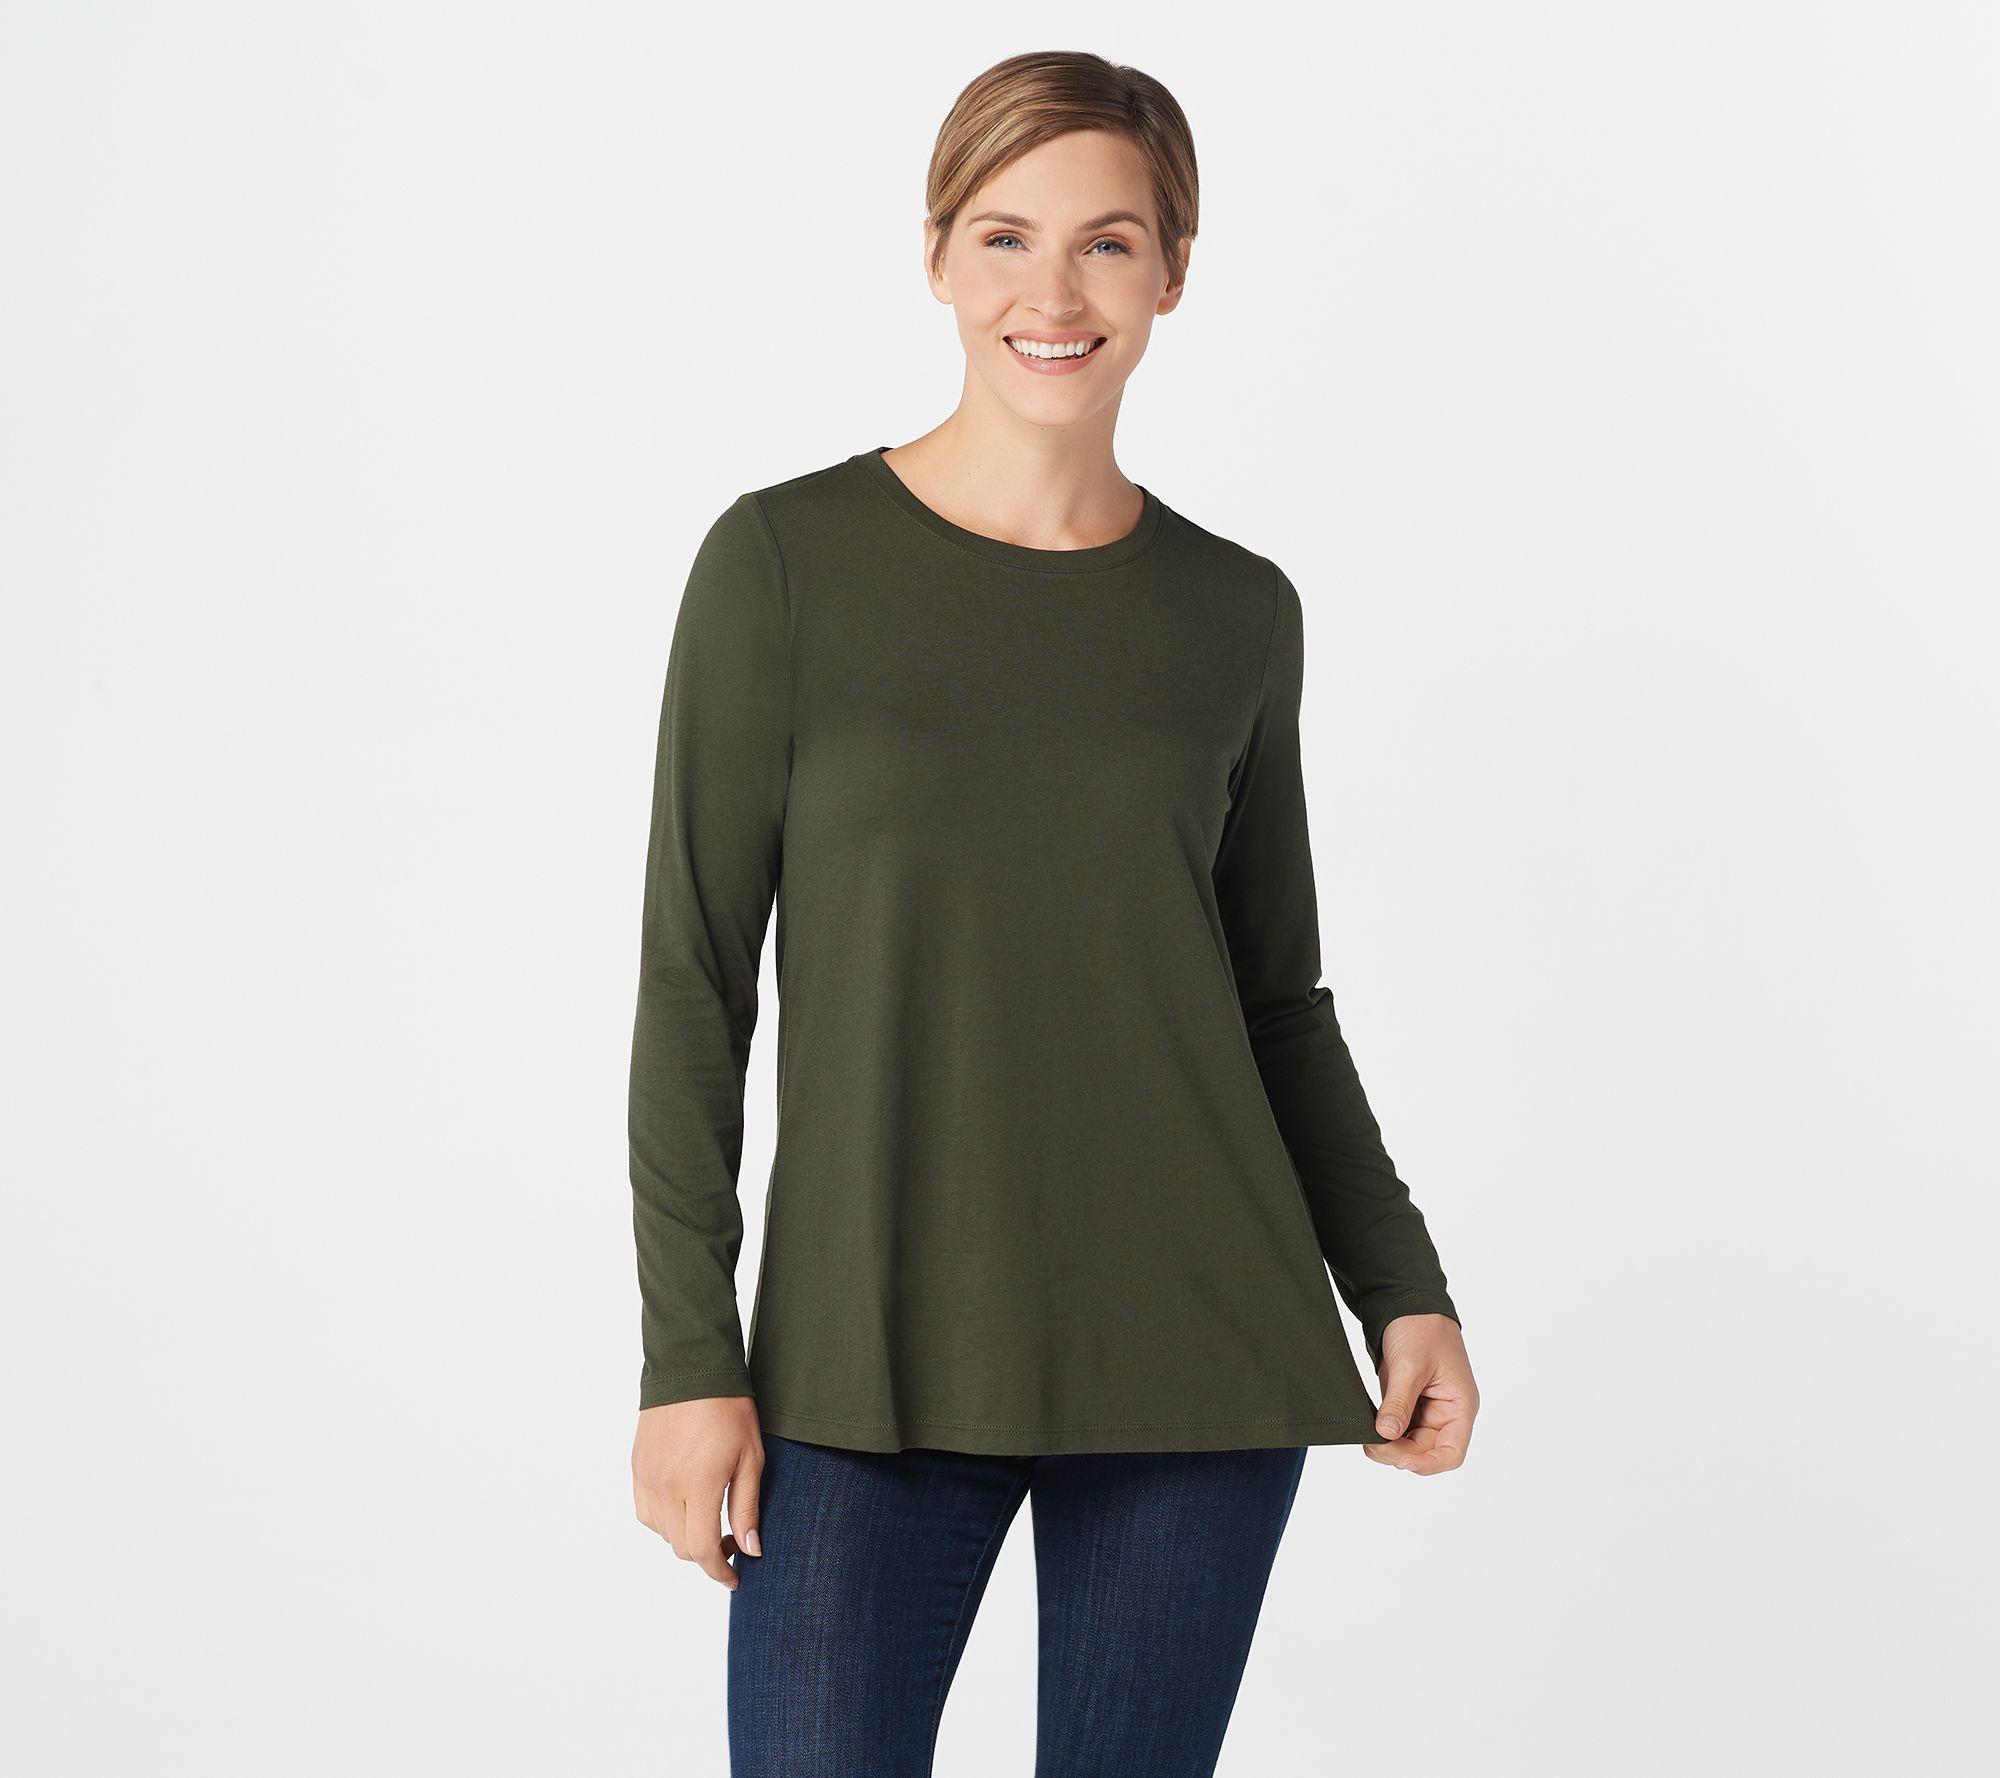 Burgundy Dip Dye Open Crochet Shoulder French Terry Long Sleeve Sweatshirt Top